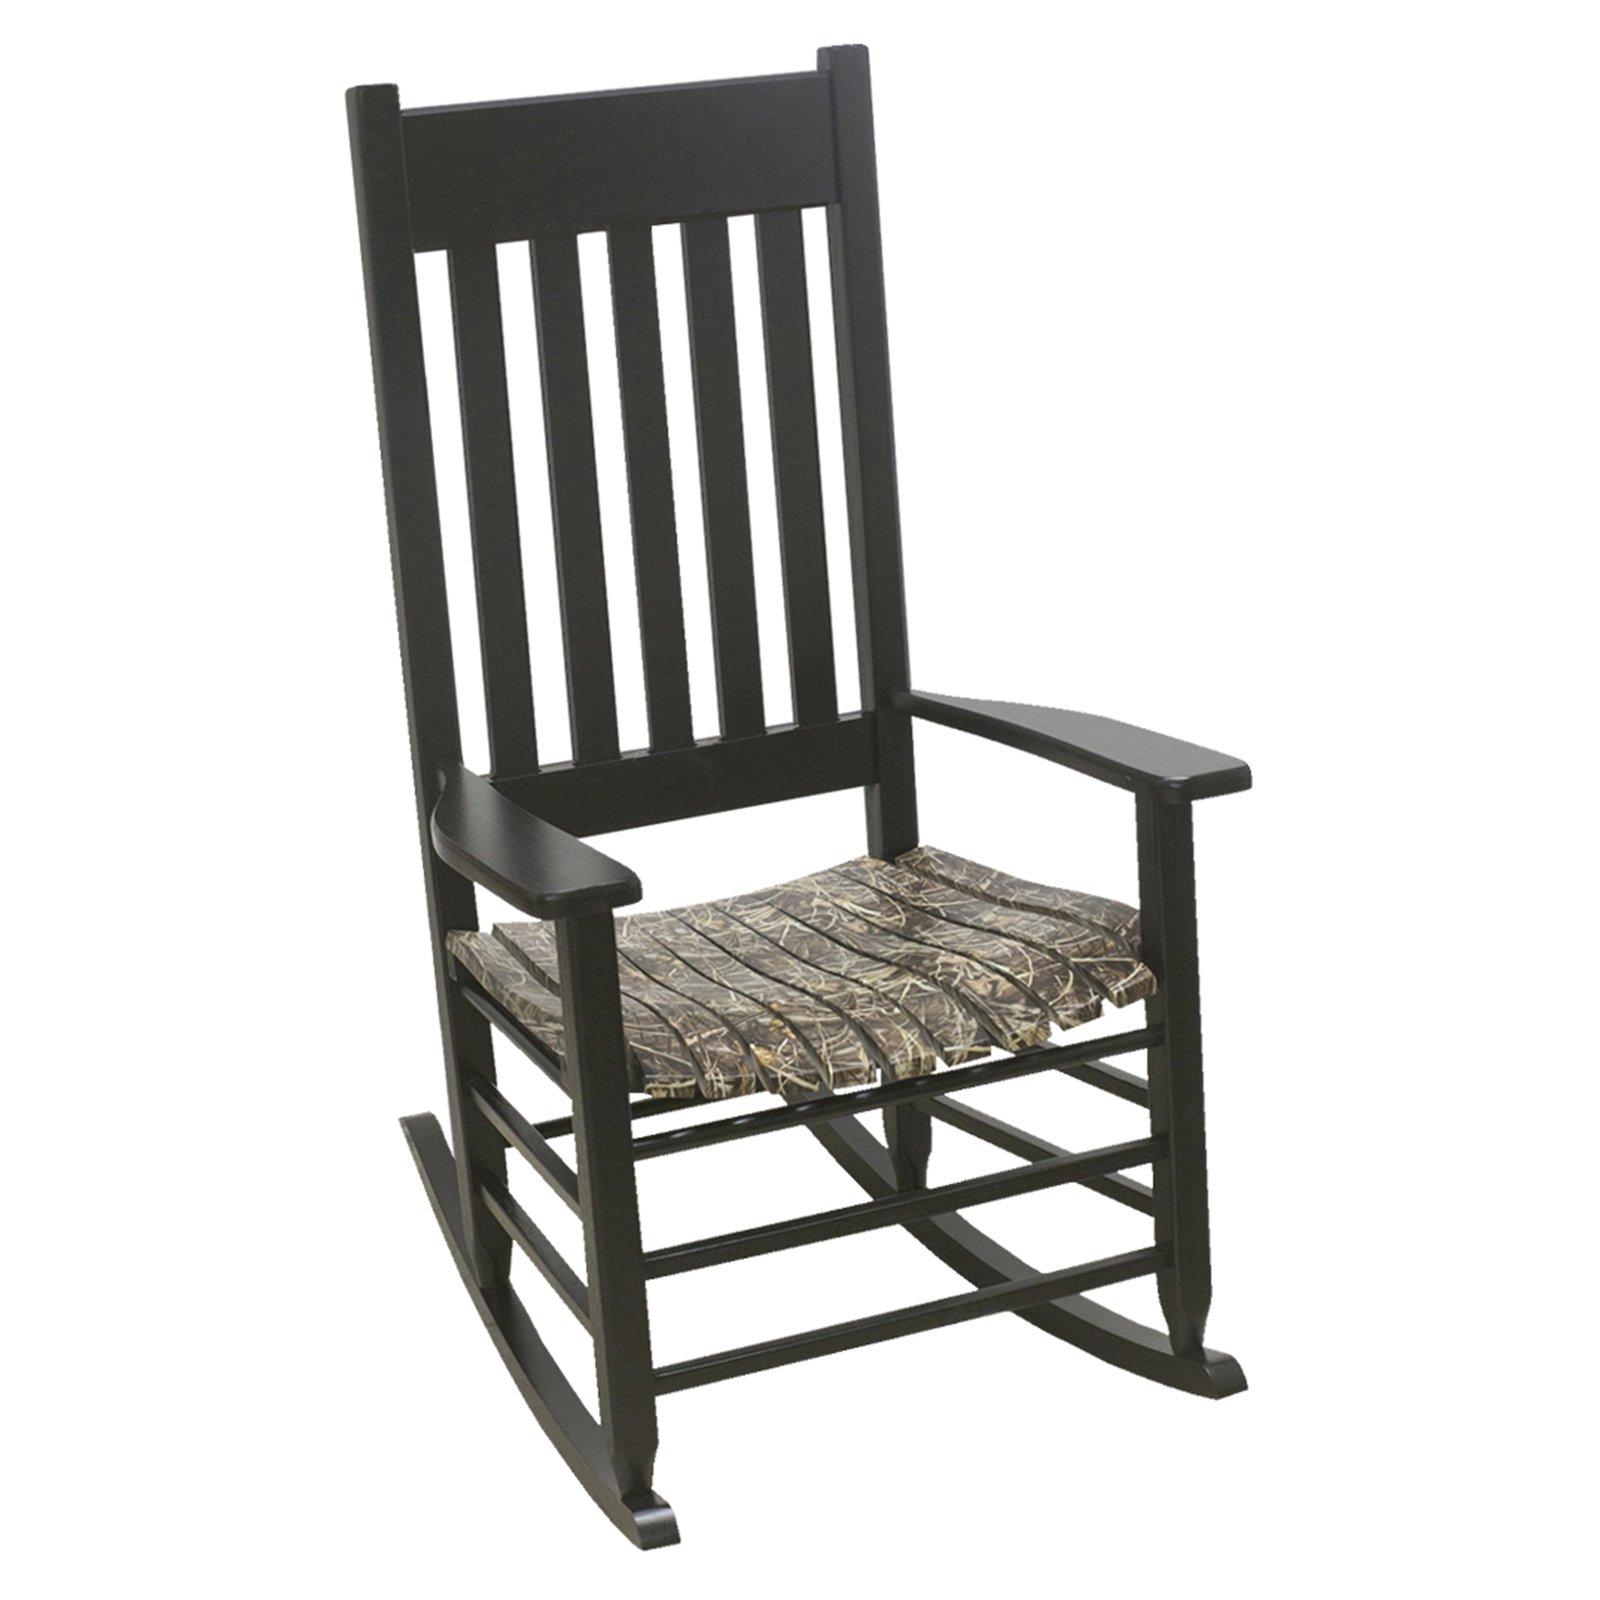 Hinkle Chair Company RealTree Rocking Chair